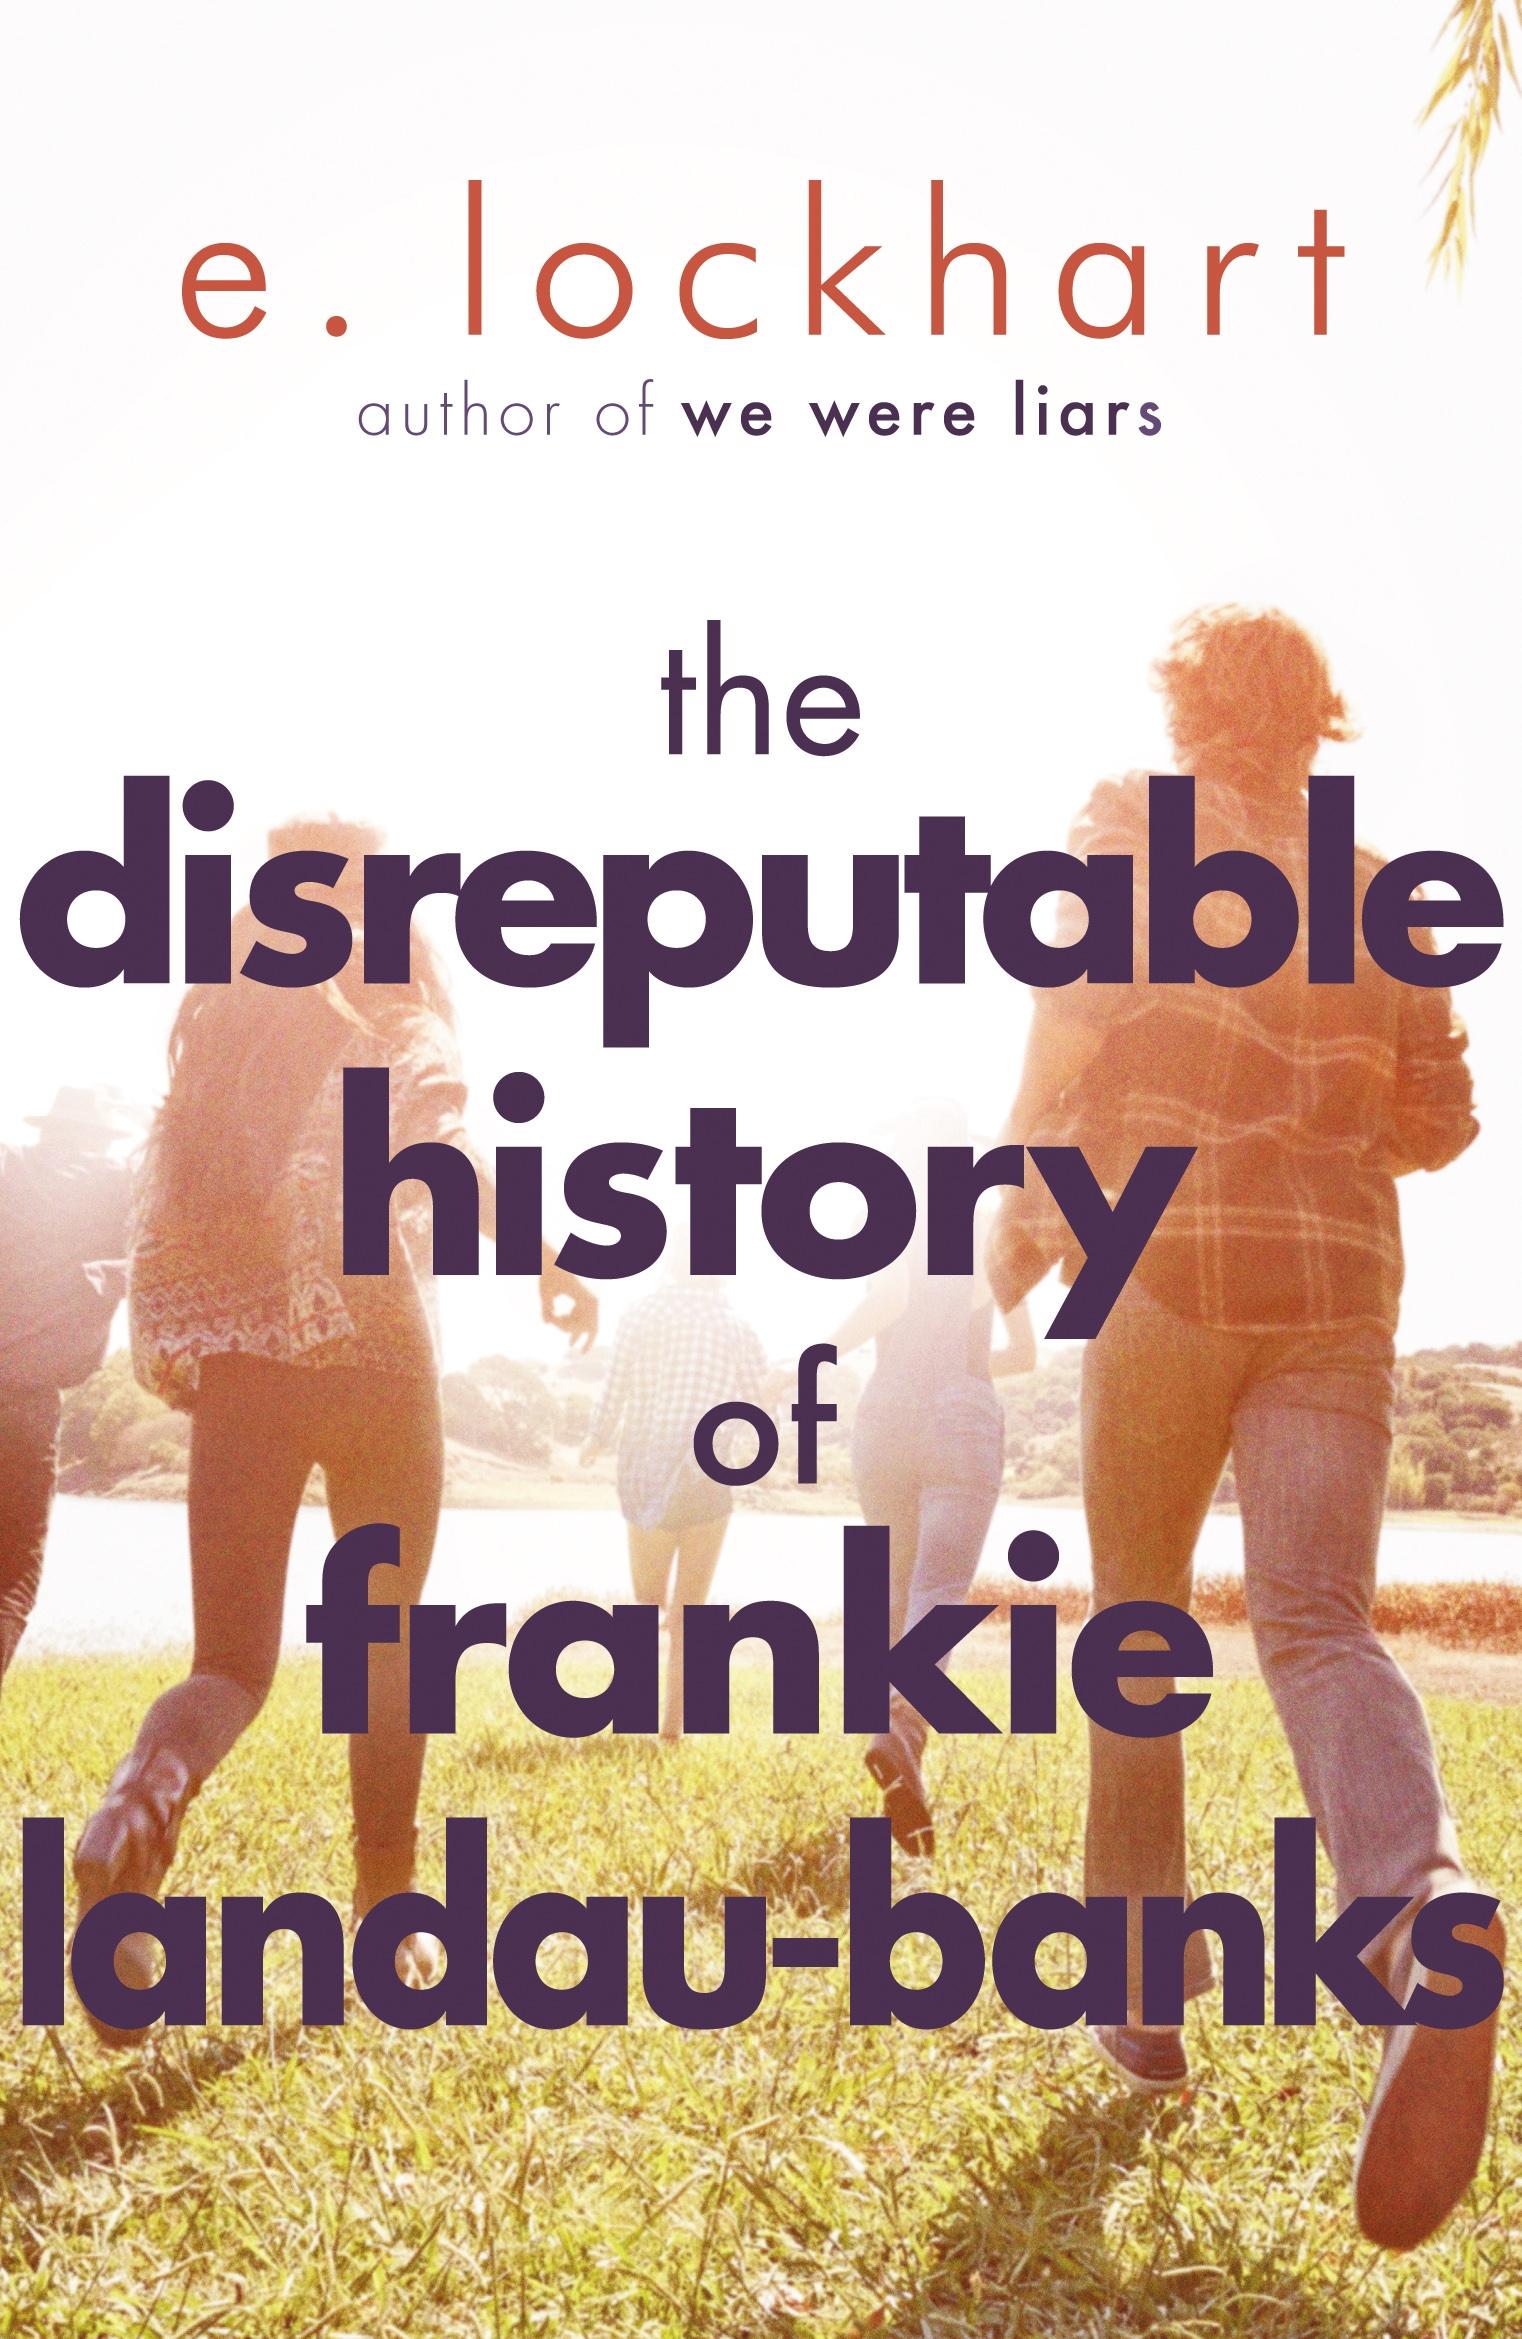 The Disreputable History of Frankie Landau-Banks by E. LockhartEmily Jenkins